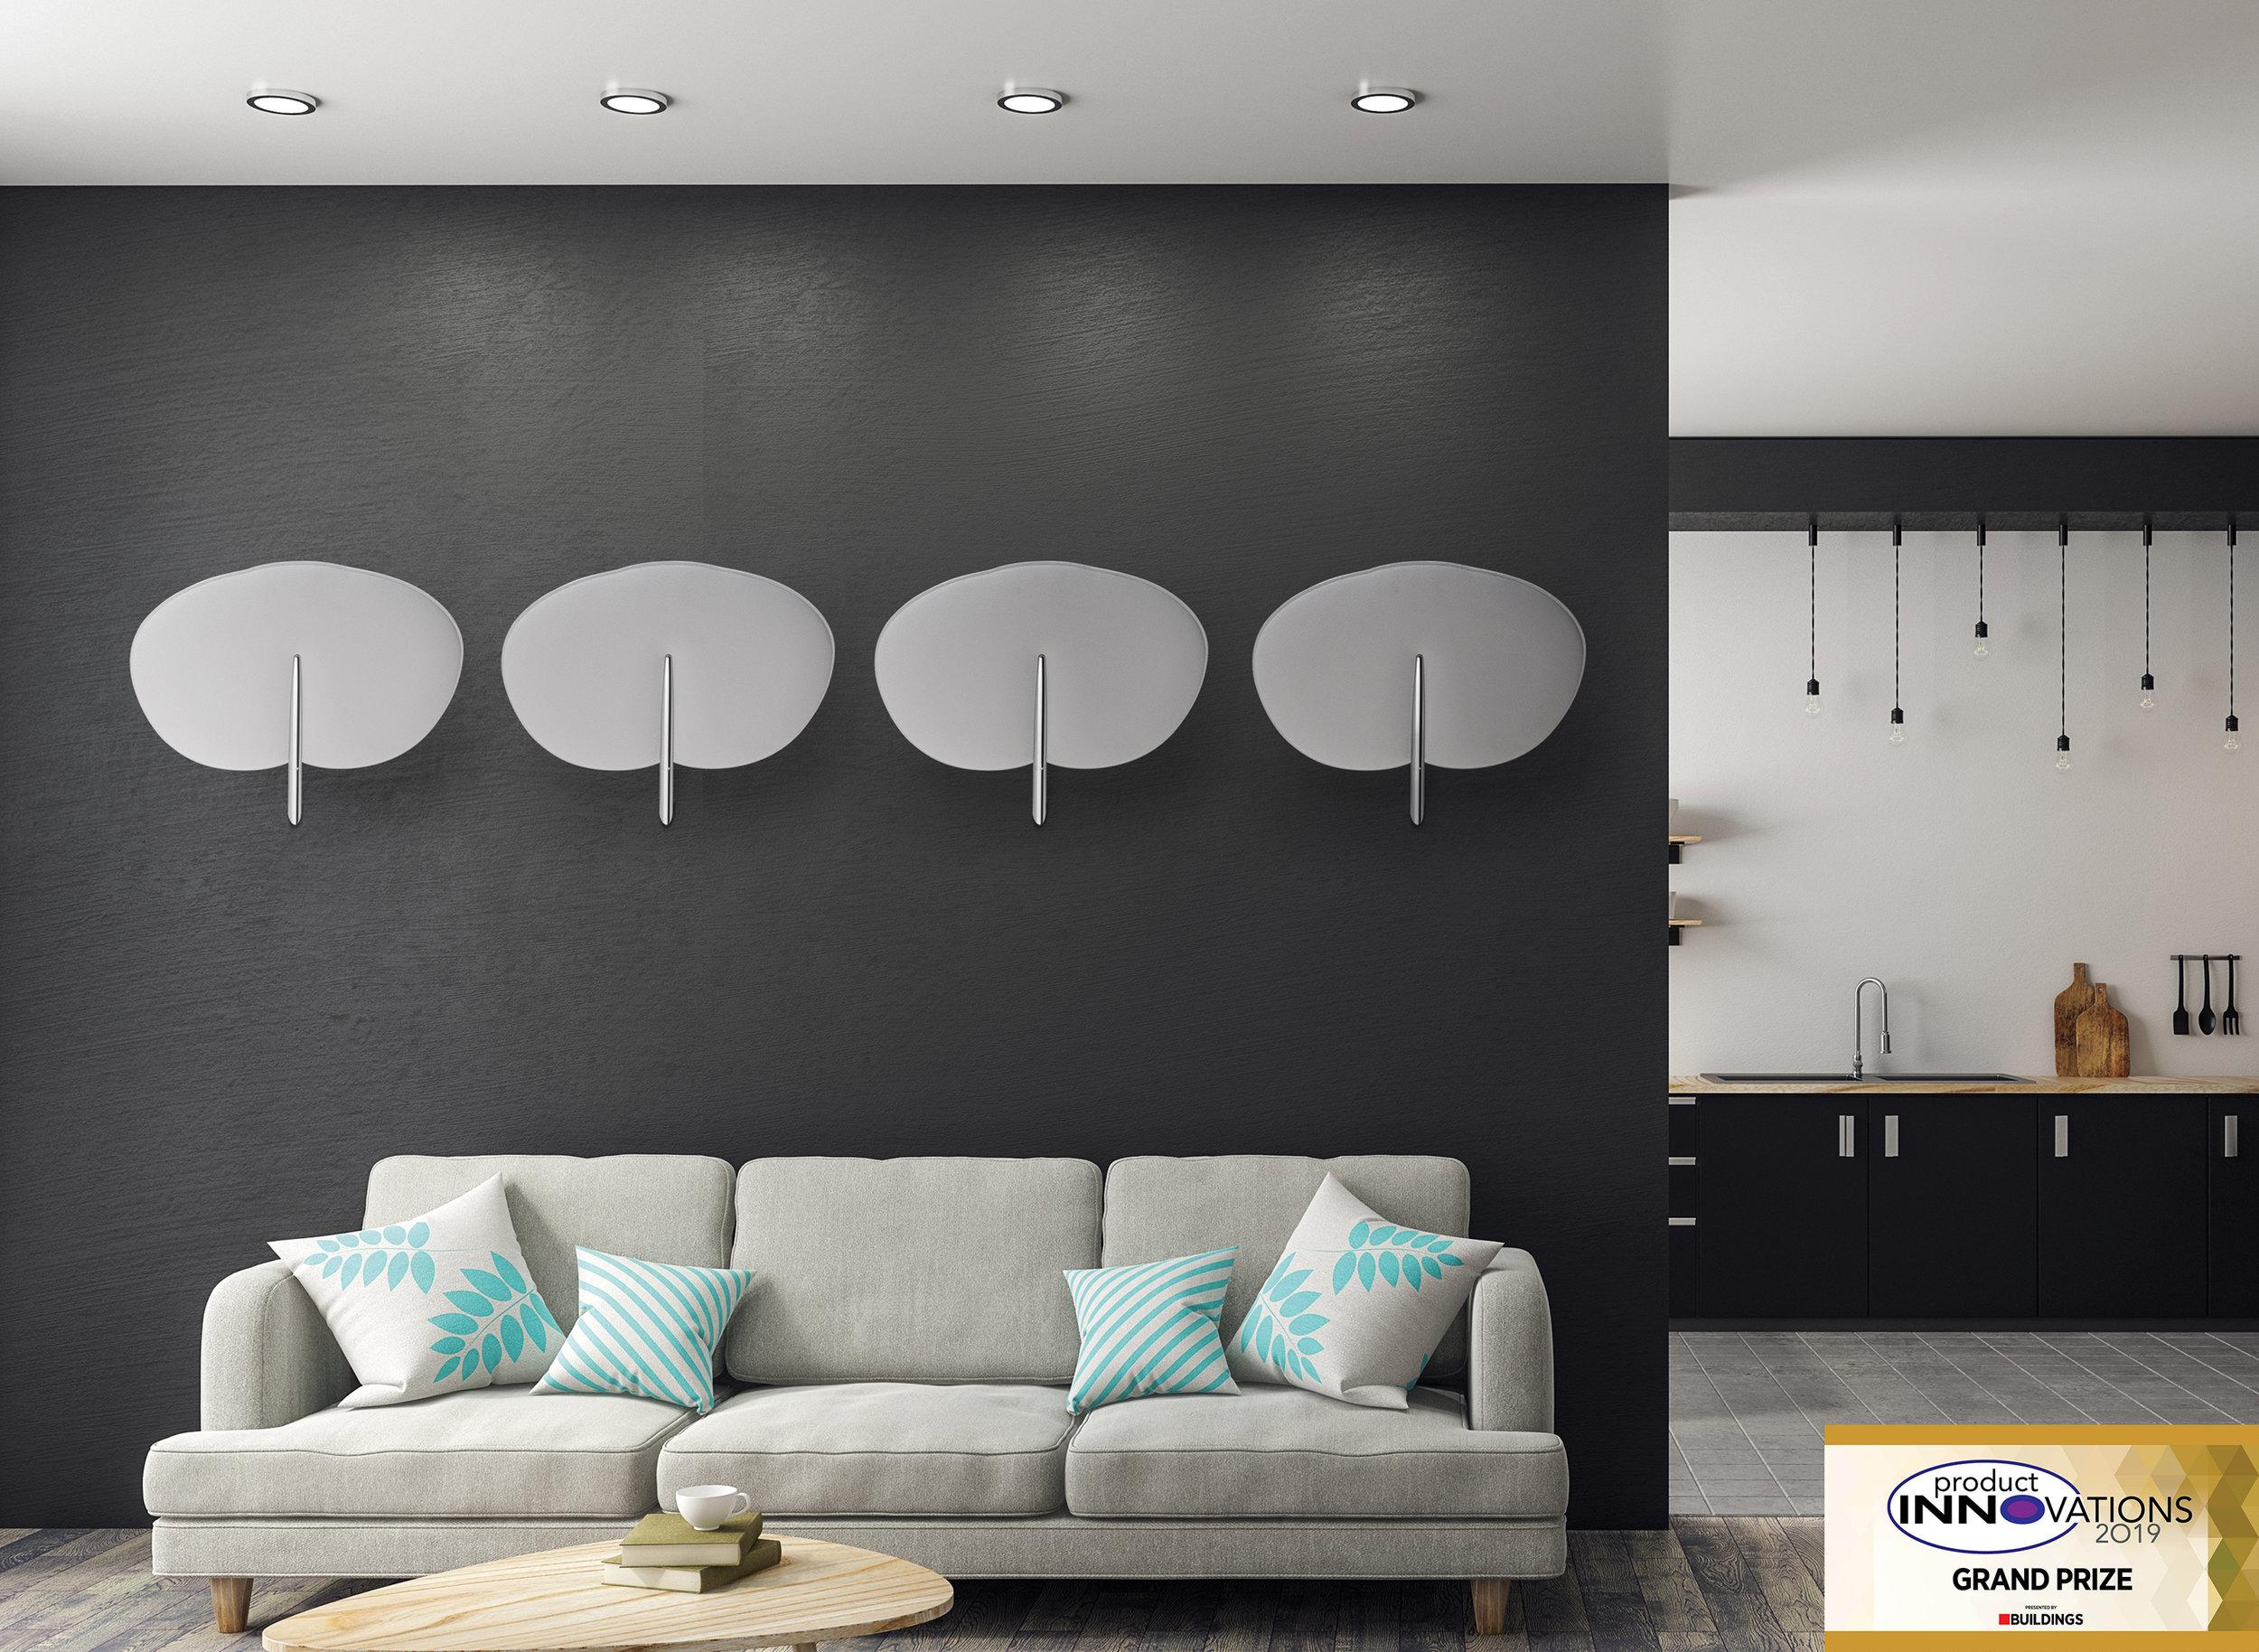 Botanica Wall Home_Product Innovations.jpg